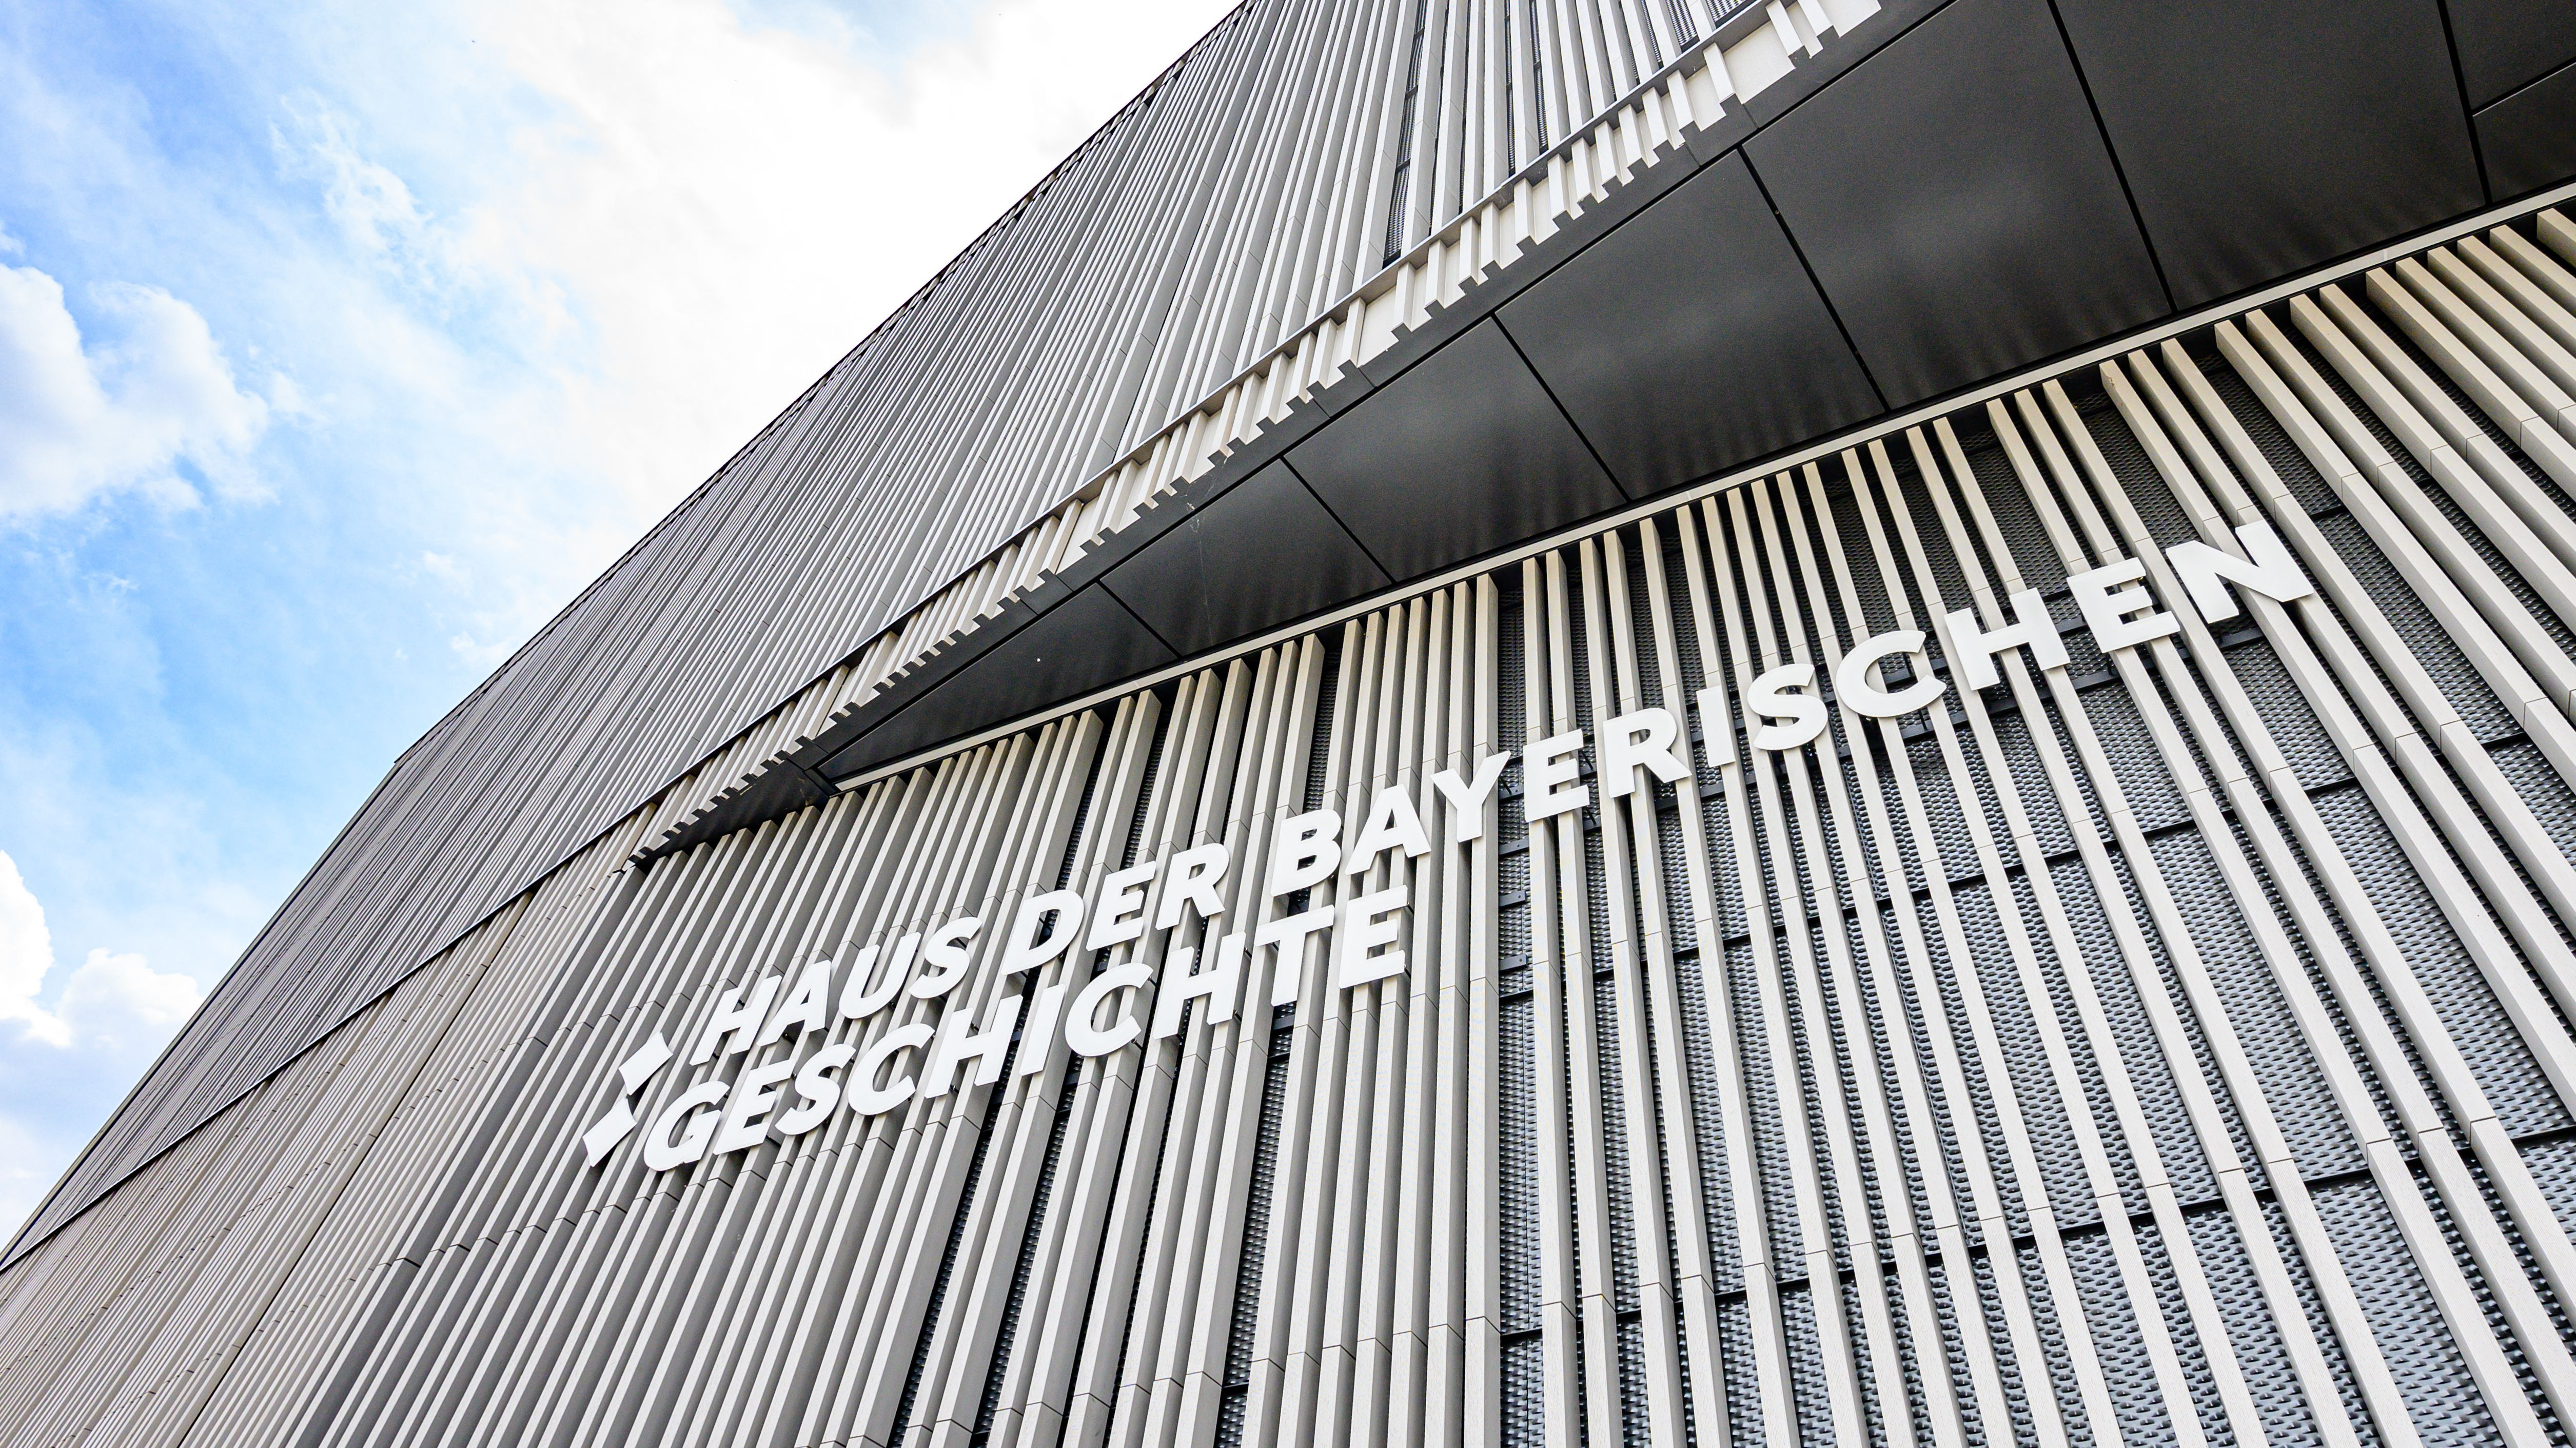 Fassade des Museums der Bayerischen Geschichte